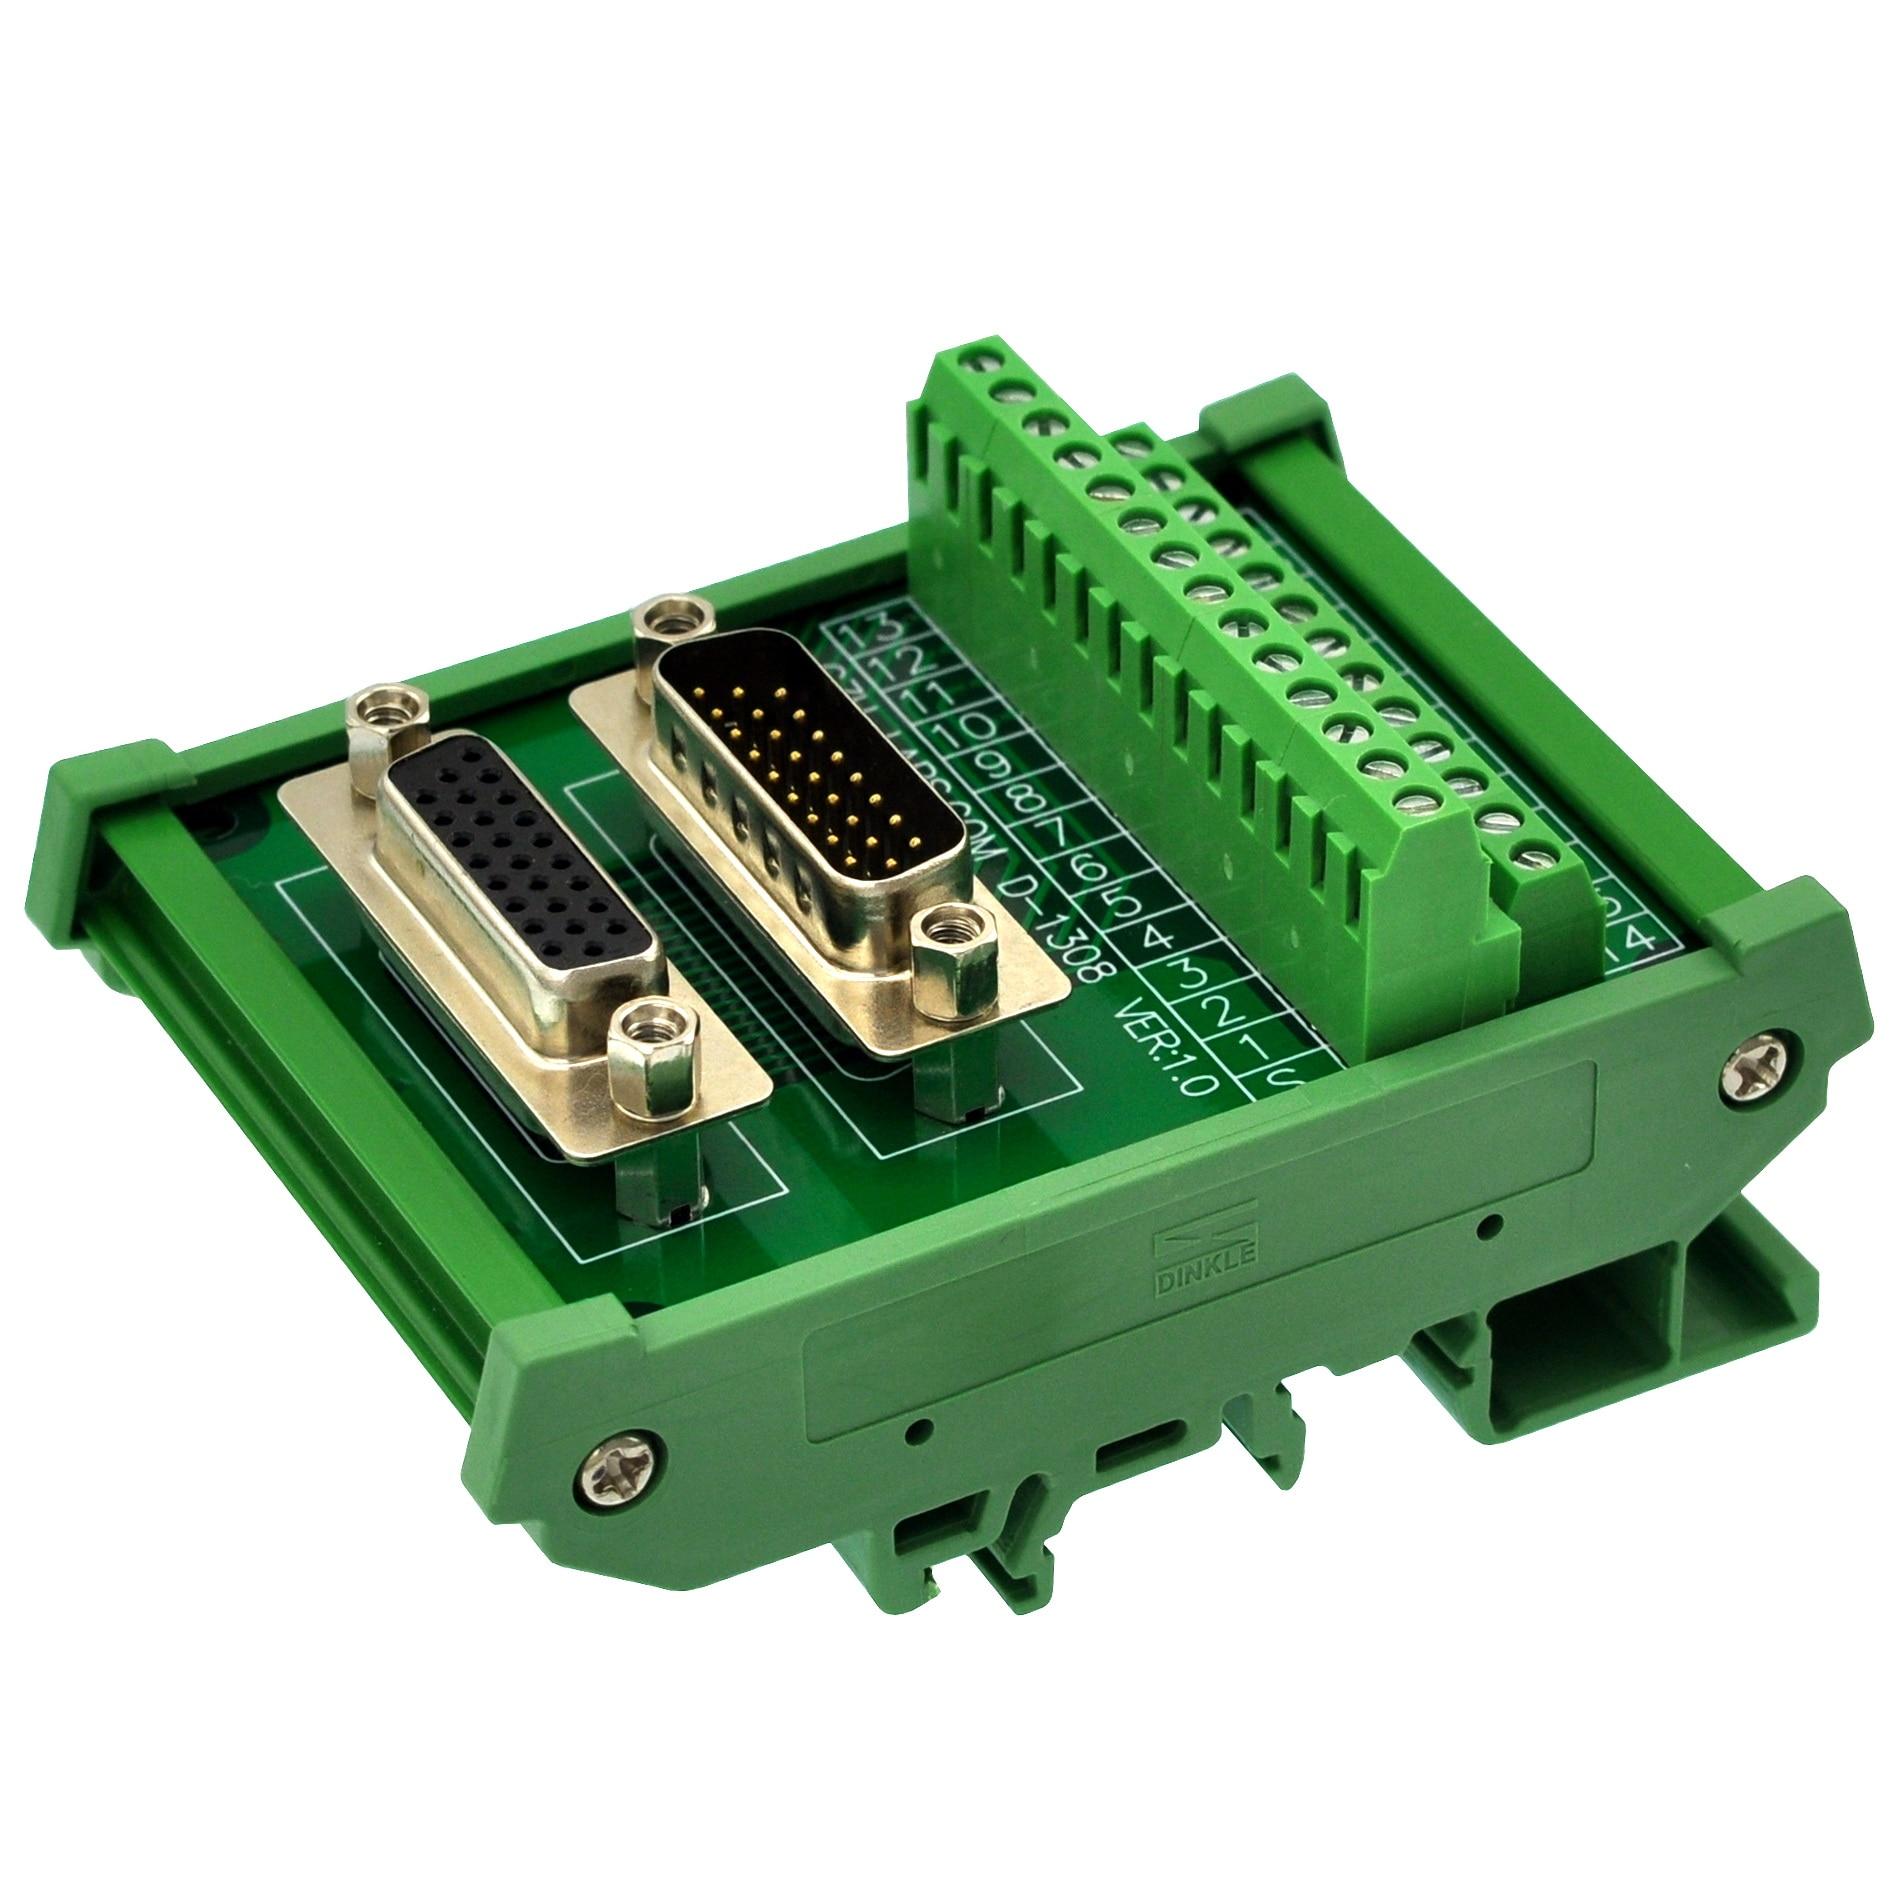 Módulo de interfaz macho/hembra DSUB DB26HD de montaje en carril DIN CZH-LABS, placa de adaptación D-SUB.